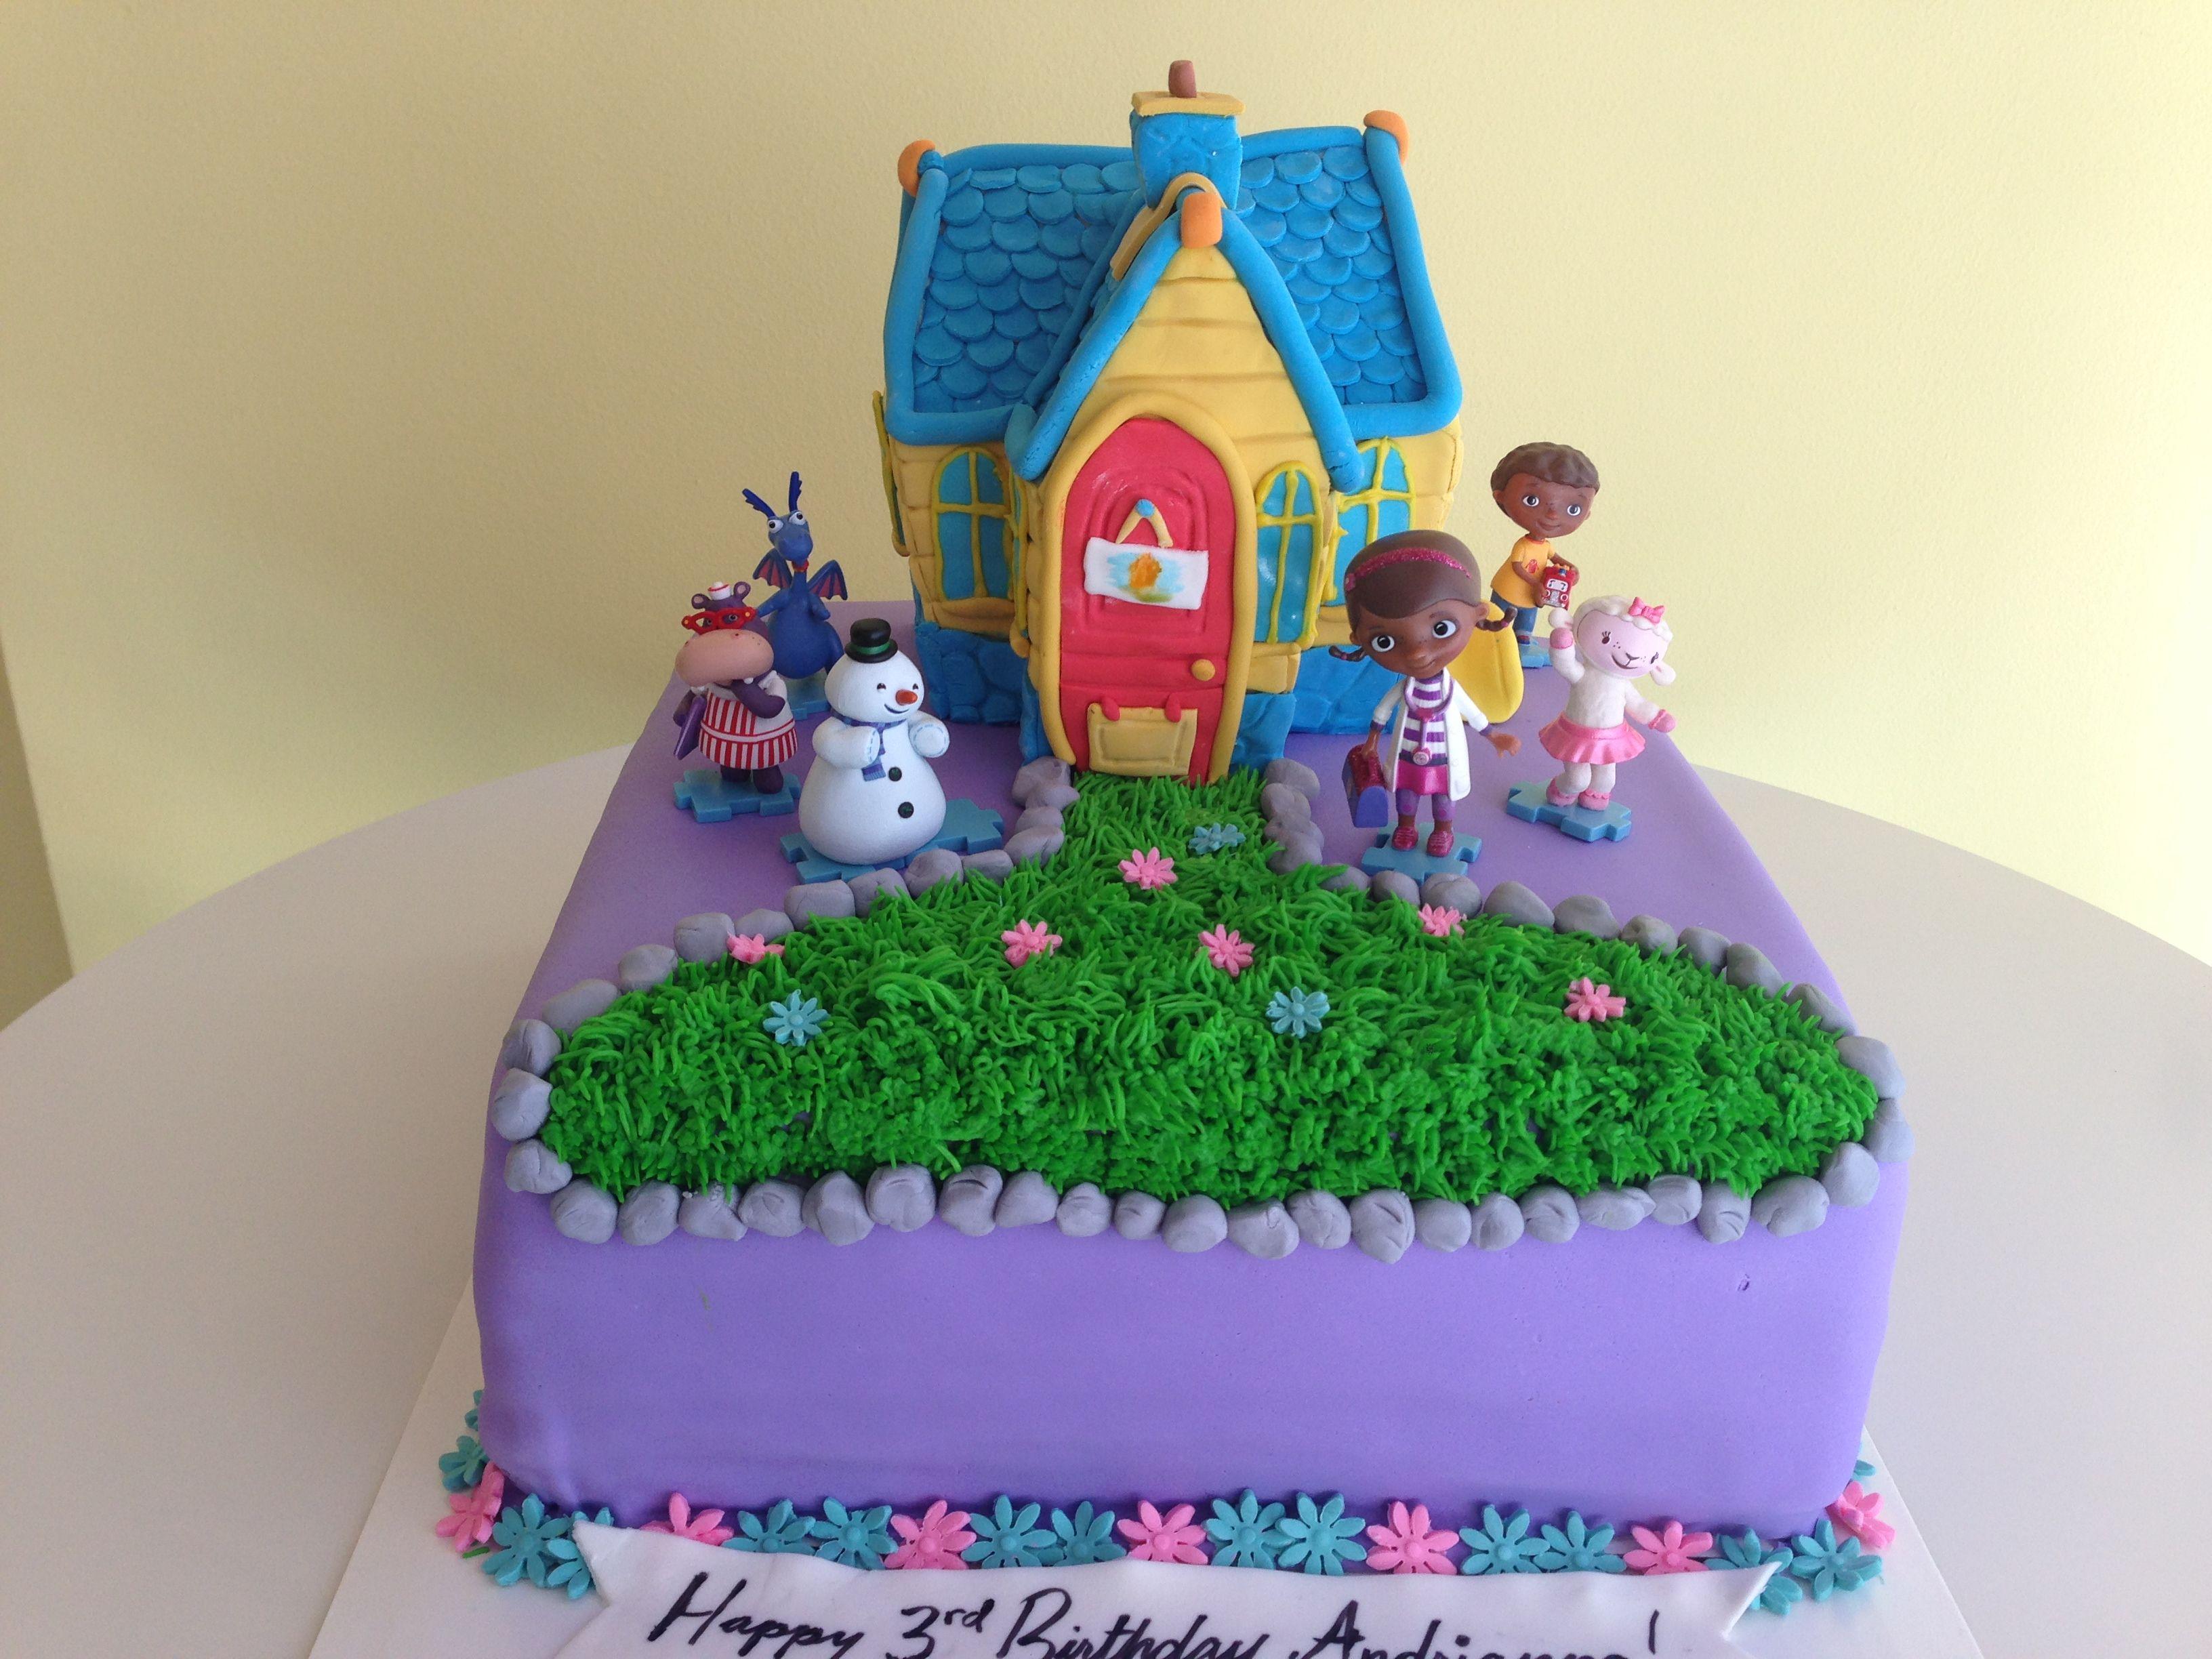 Doc mcstuffins bandages doc mcstuffins party ideas on pinterest doc - Doc Mcstuffins Clinic Cake For Eiliyah S 5th Birthday